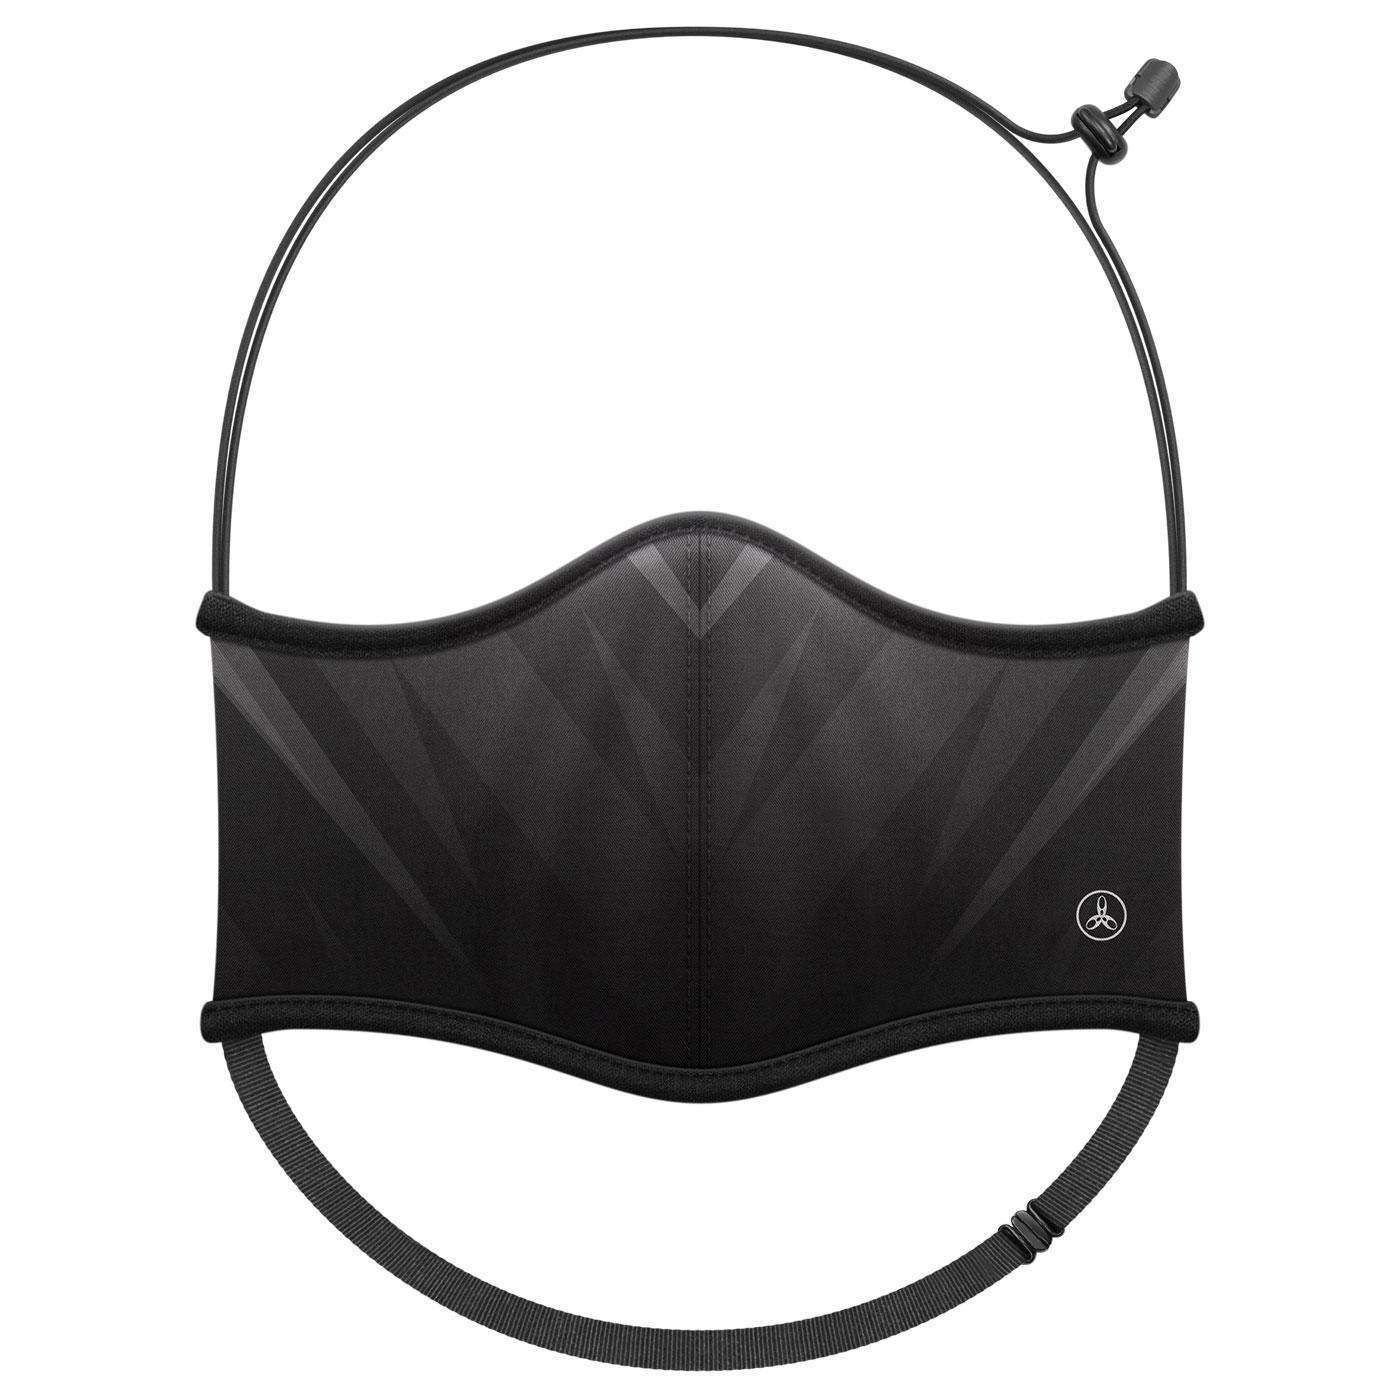 HODARLA 運動舒適口罩6032201 - 深灰